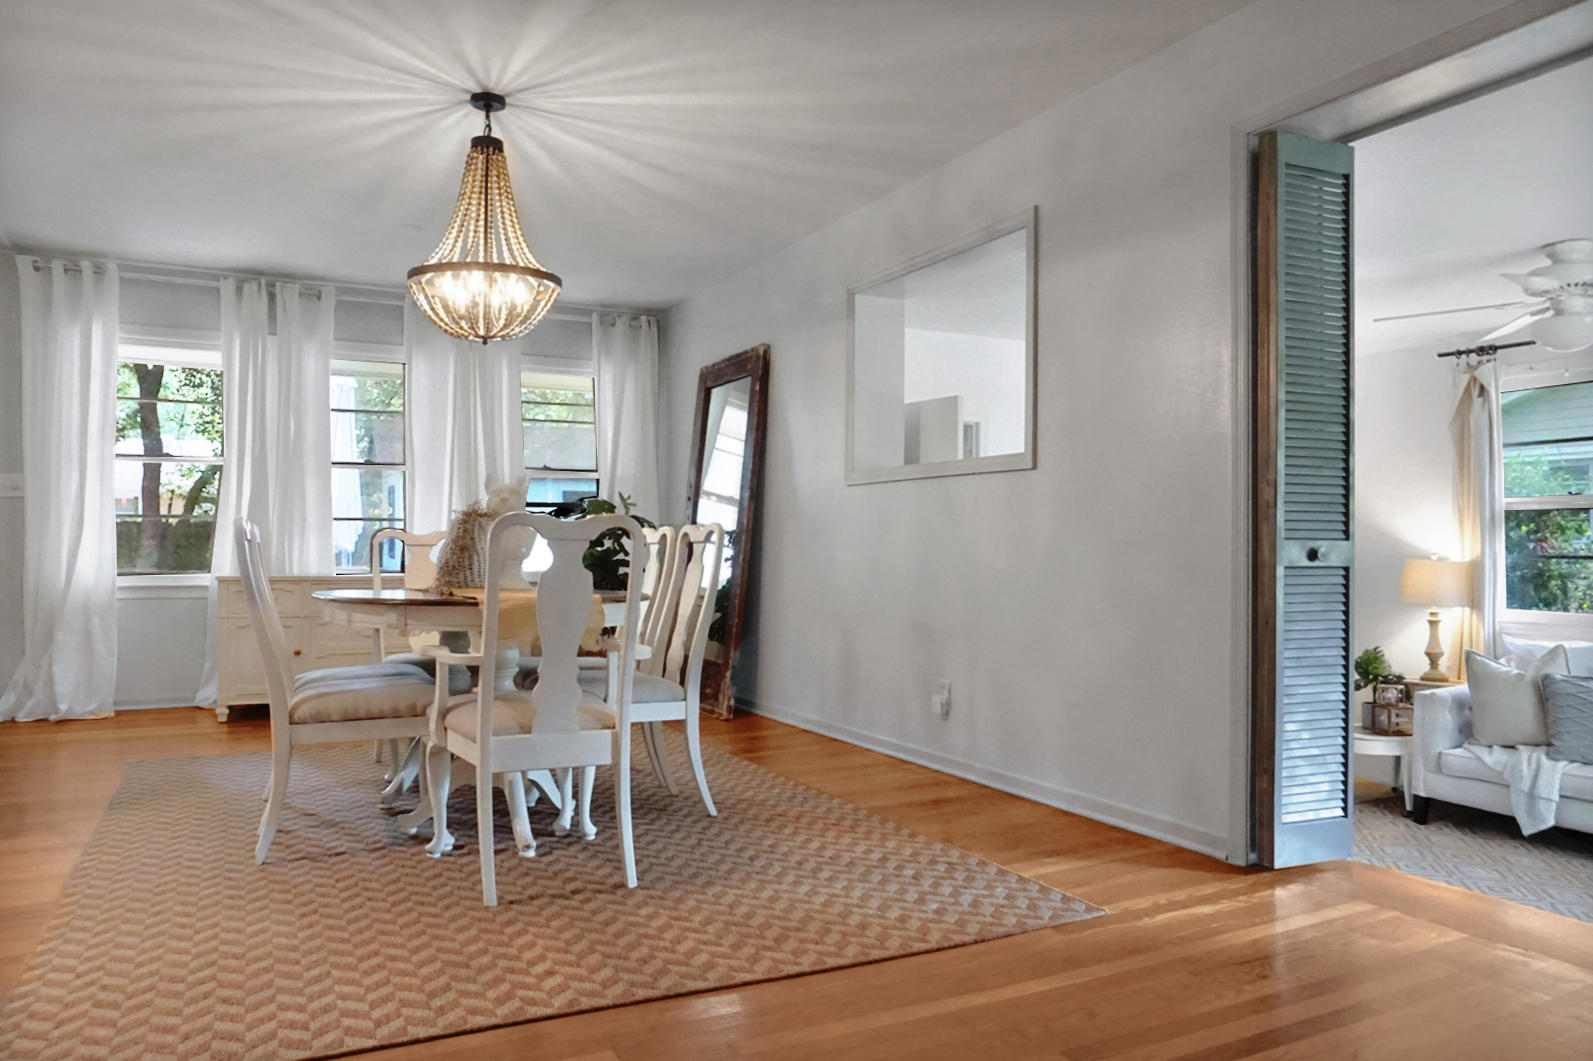 Oakland Homes For Sale - 408 Arlington, Charleston, SC - 22